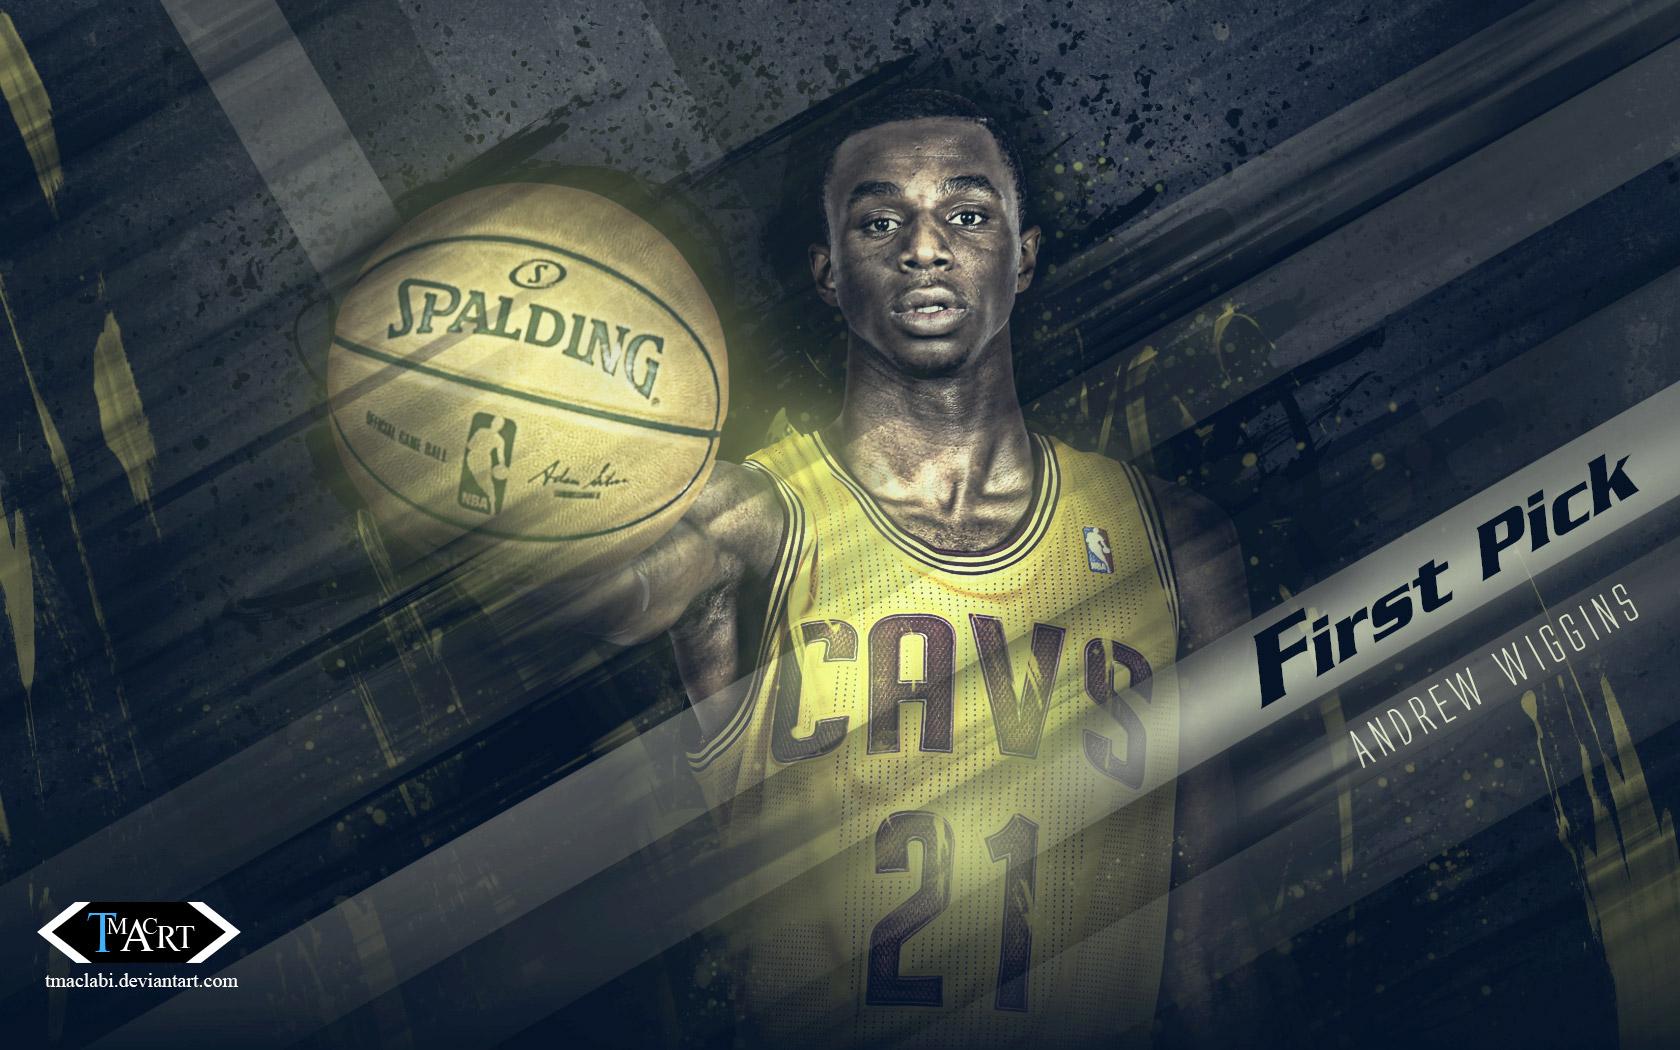 Andrew Wiggins Cavs First Pick 2014 Wallpaper Basketball 1680x1050